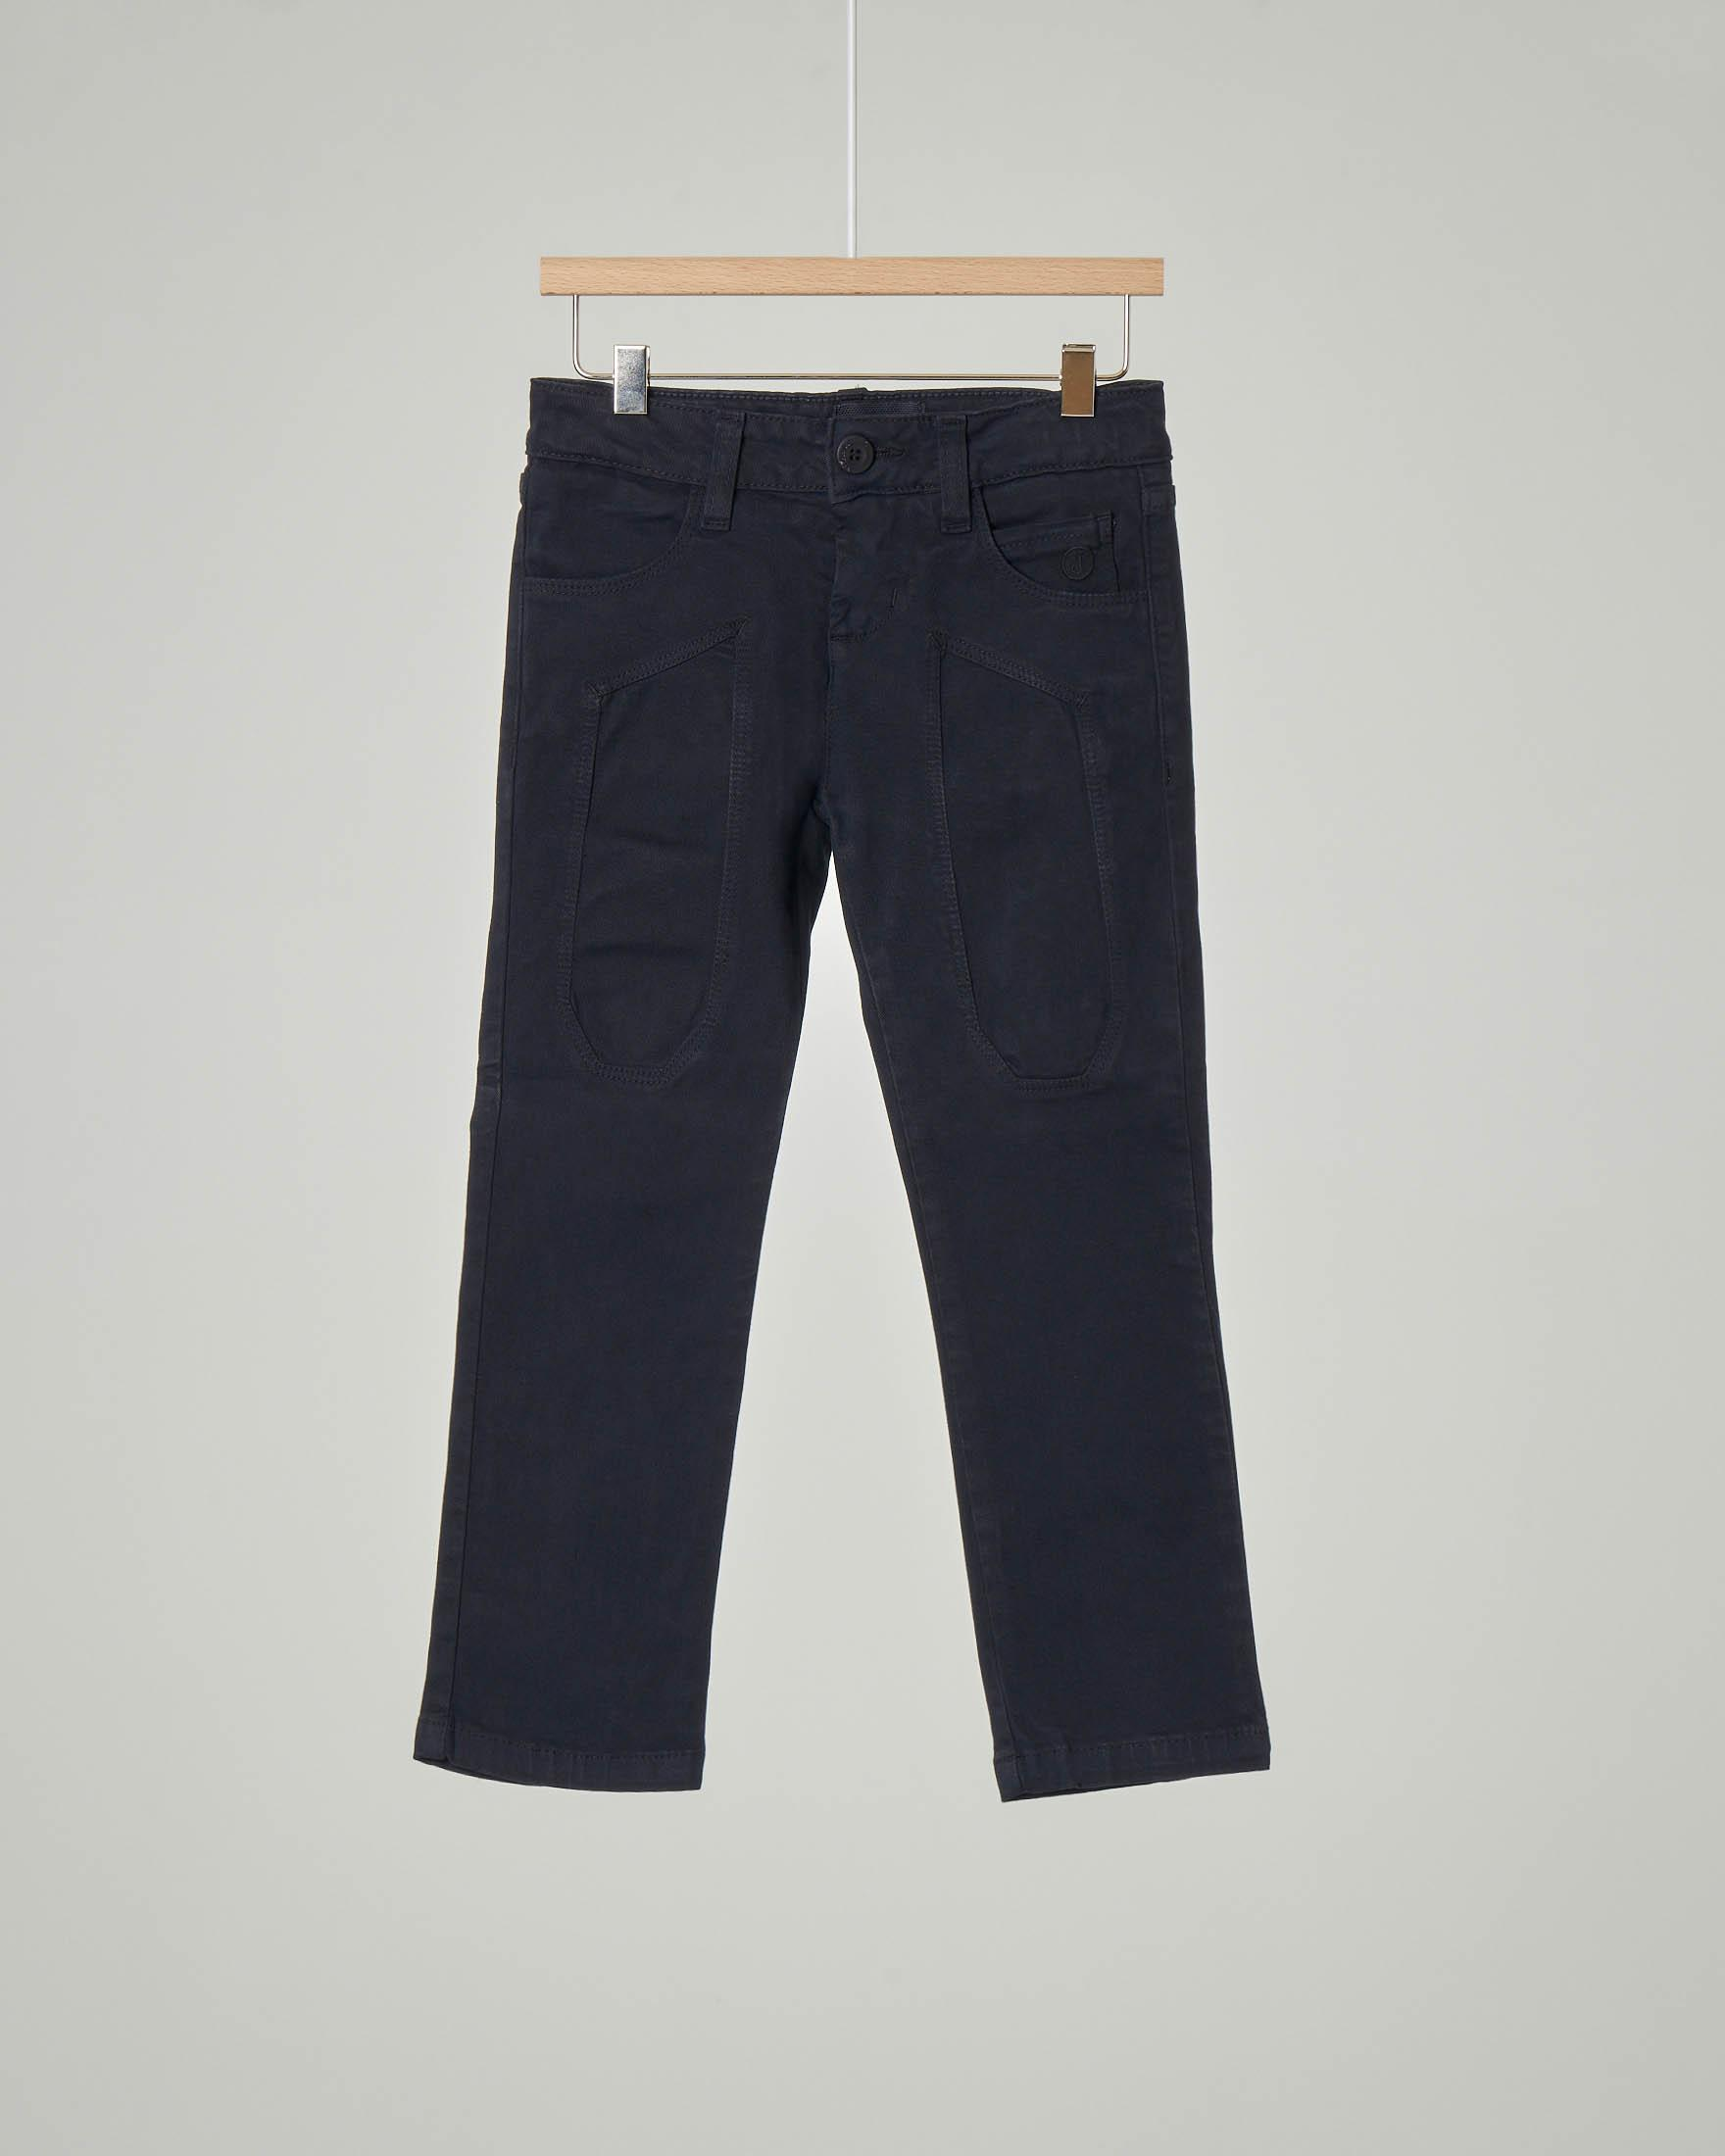 Pantalone blu cinque tasche in gabardina stretch con toppa 3-7 anni